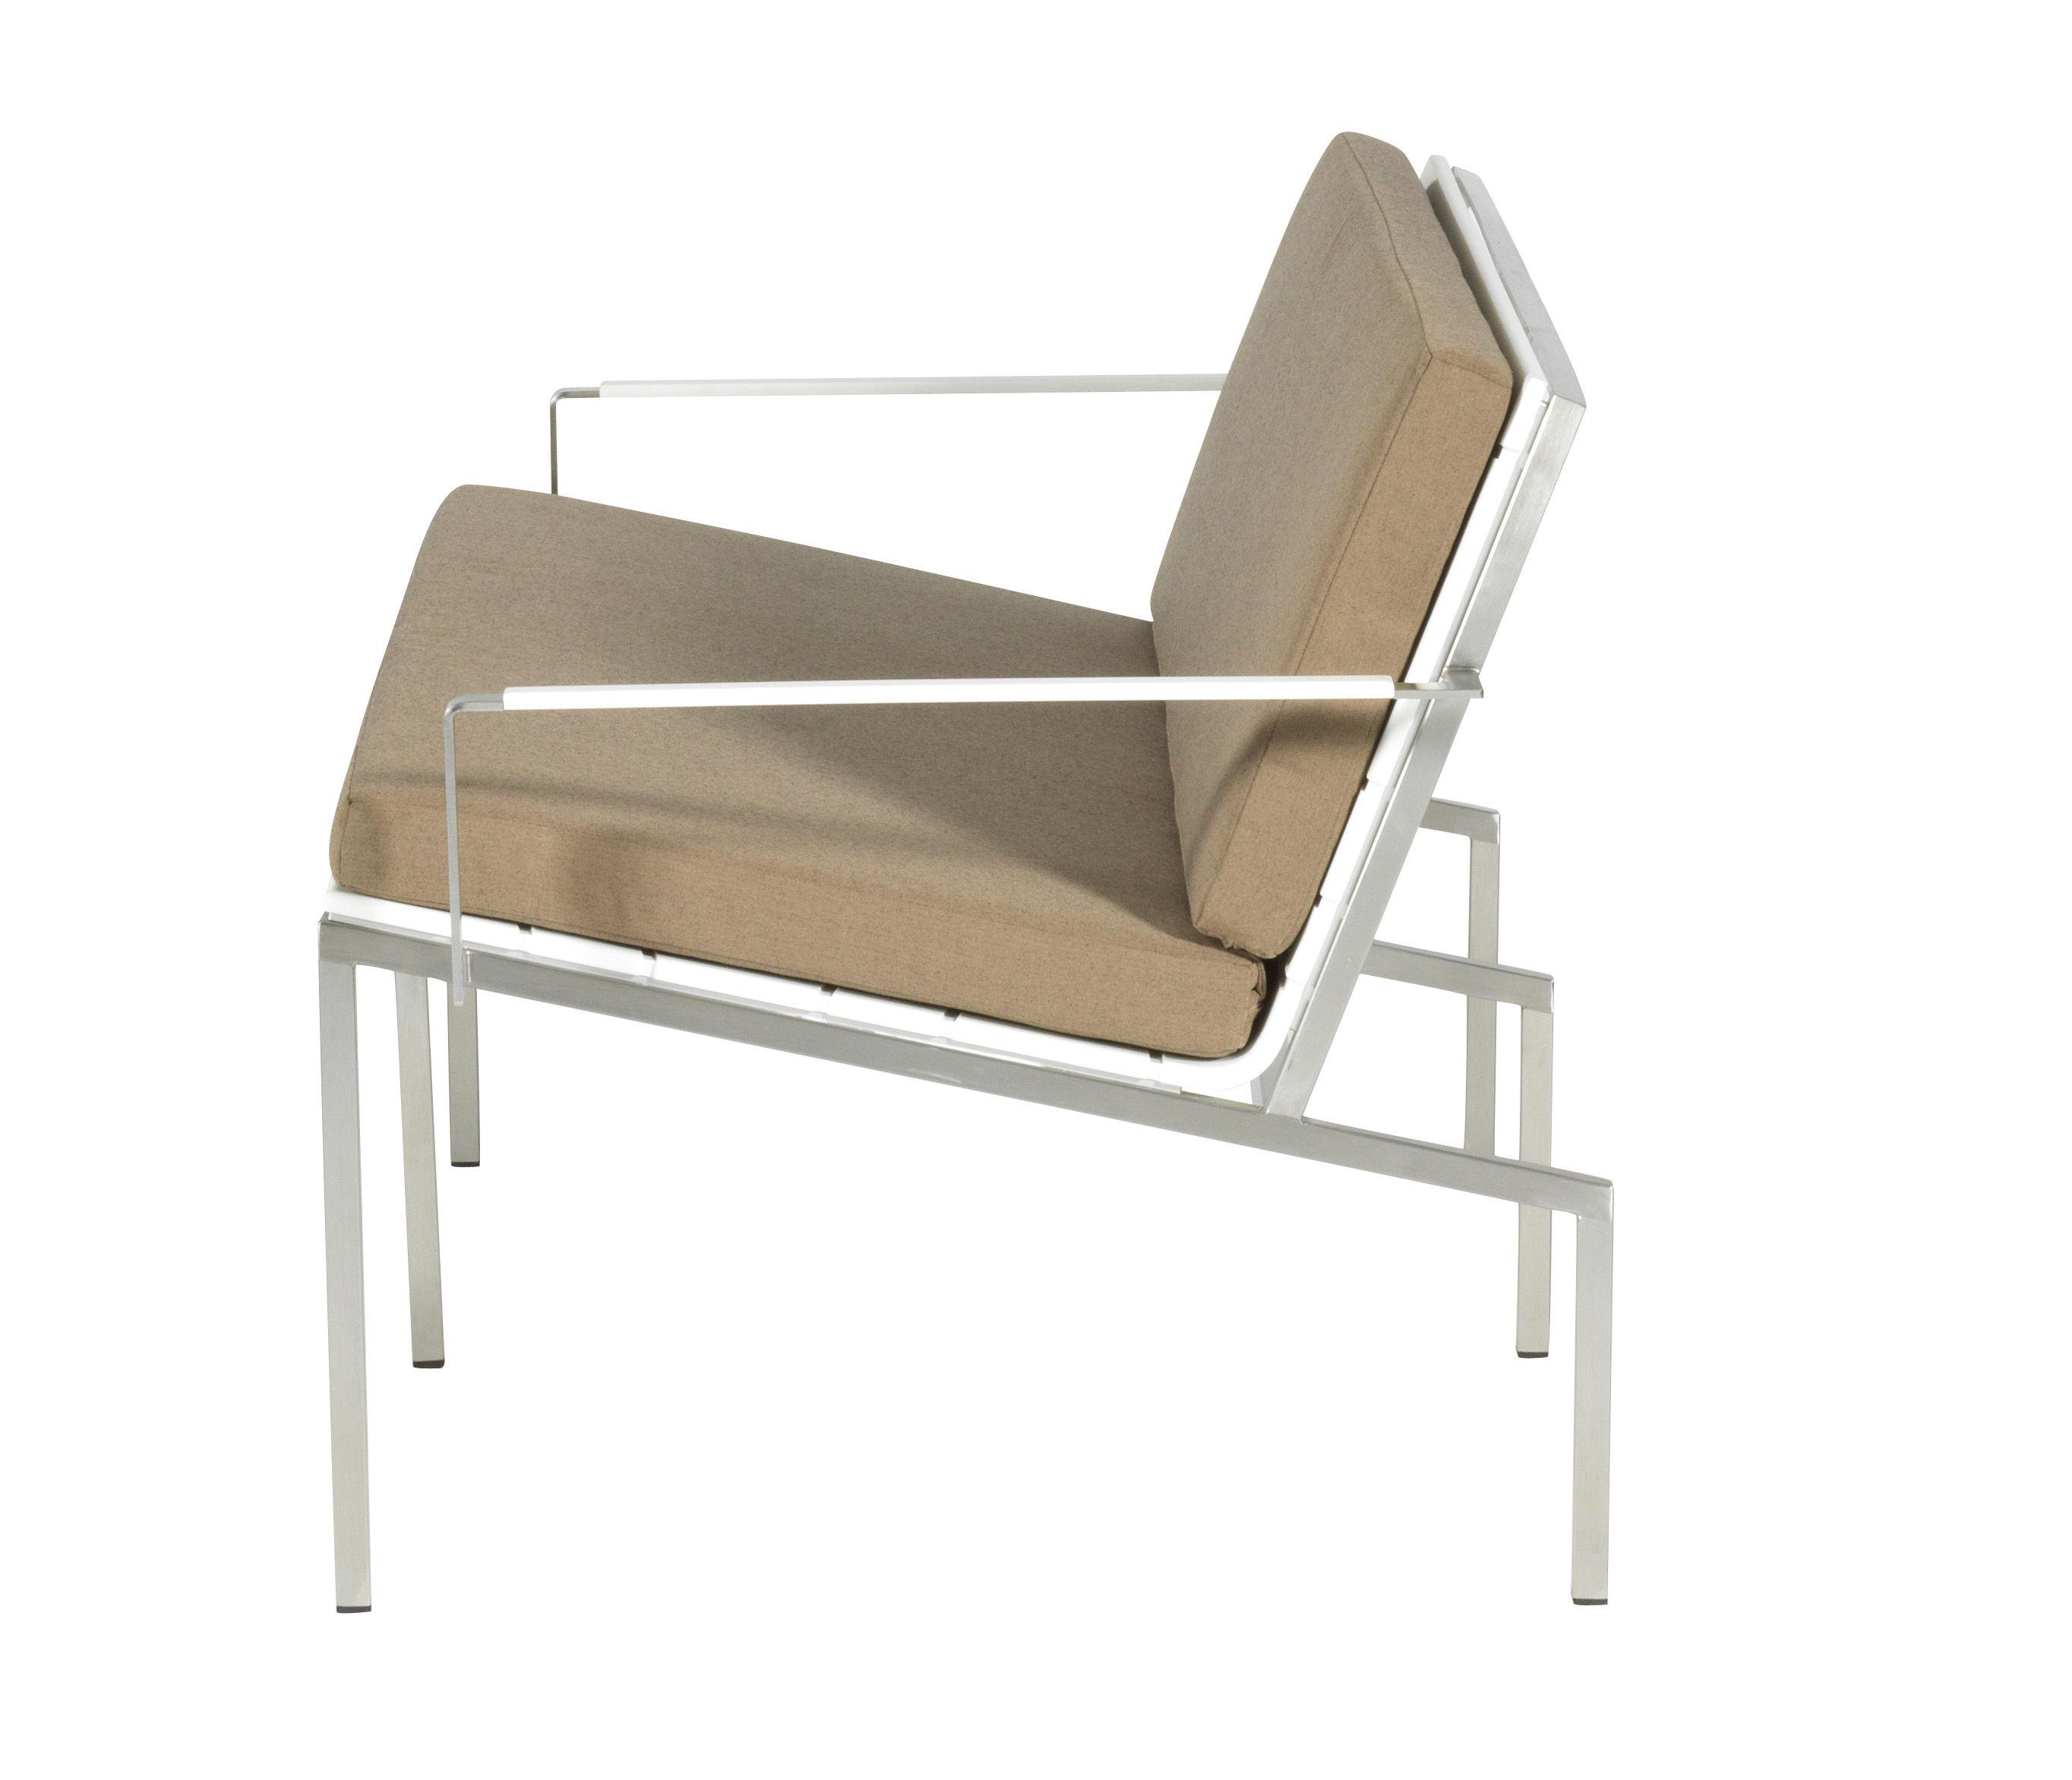 fauteuil bas bandoline fauteuil bas blanc viteo. Black Bedroom Furniture Sets. Home Design Ideas